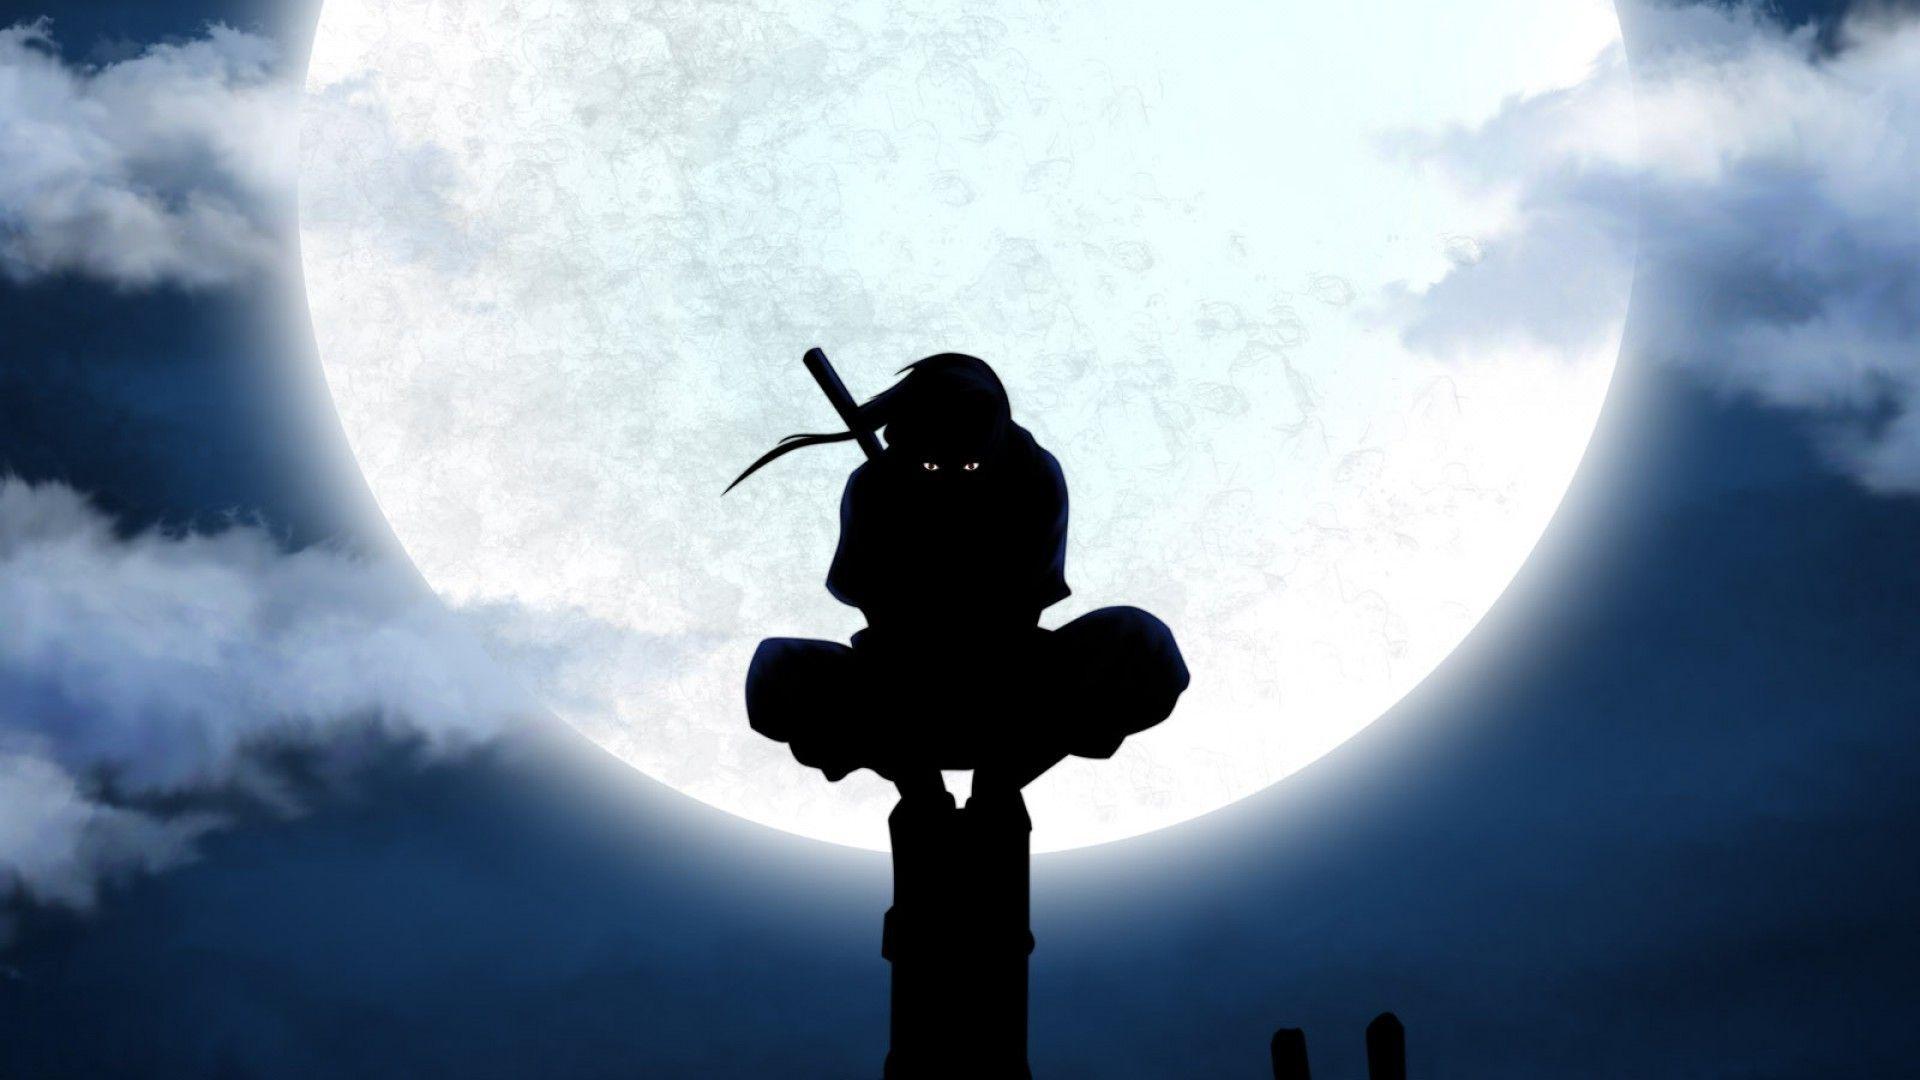 Silhouette Naruto Shippuuden Power Lines Anbu Anime Utility Pole Uchiha Itachi Moon Wa Ninja Wallpaper Naruto Wallpaper Anime Scenery Wallpaper